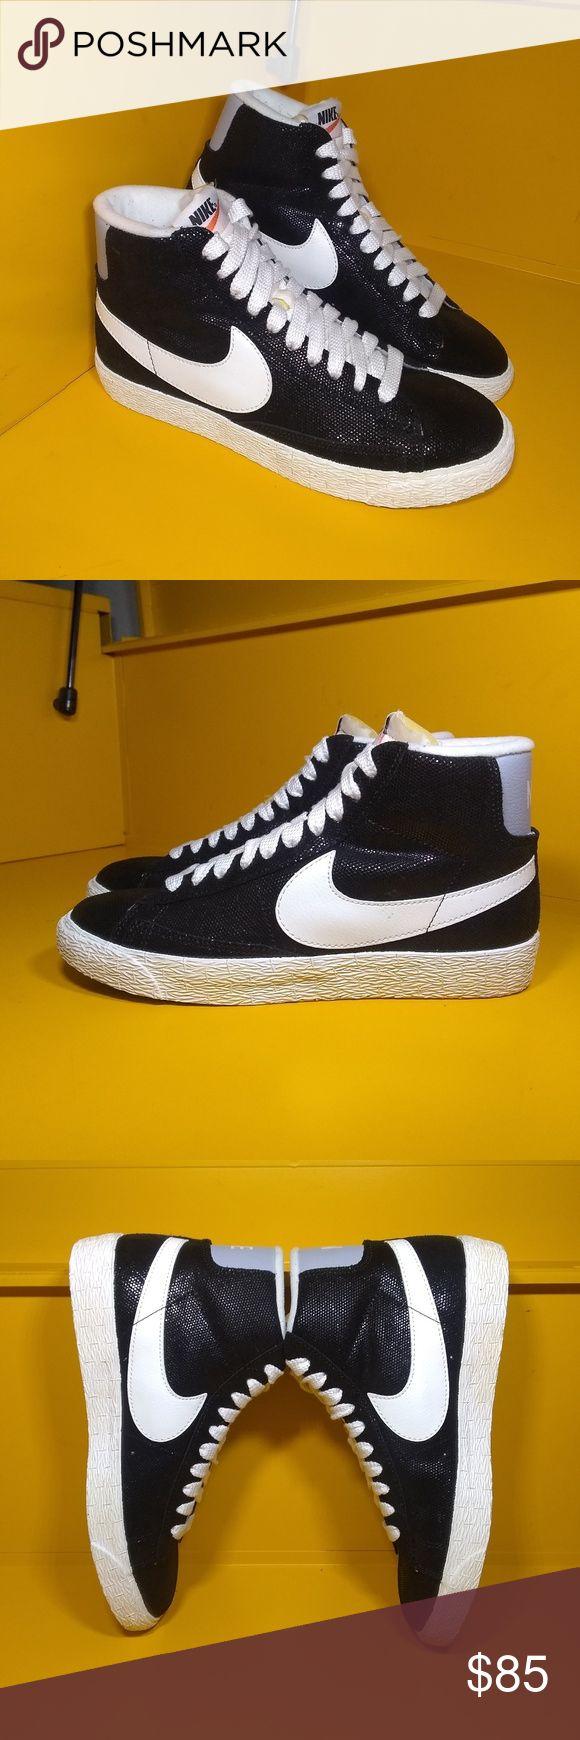 NEW Nike Blazer Mid Suede Vintage Size 6.5 Ladies – NEW with original box …   – My Posh Picks